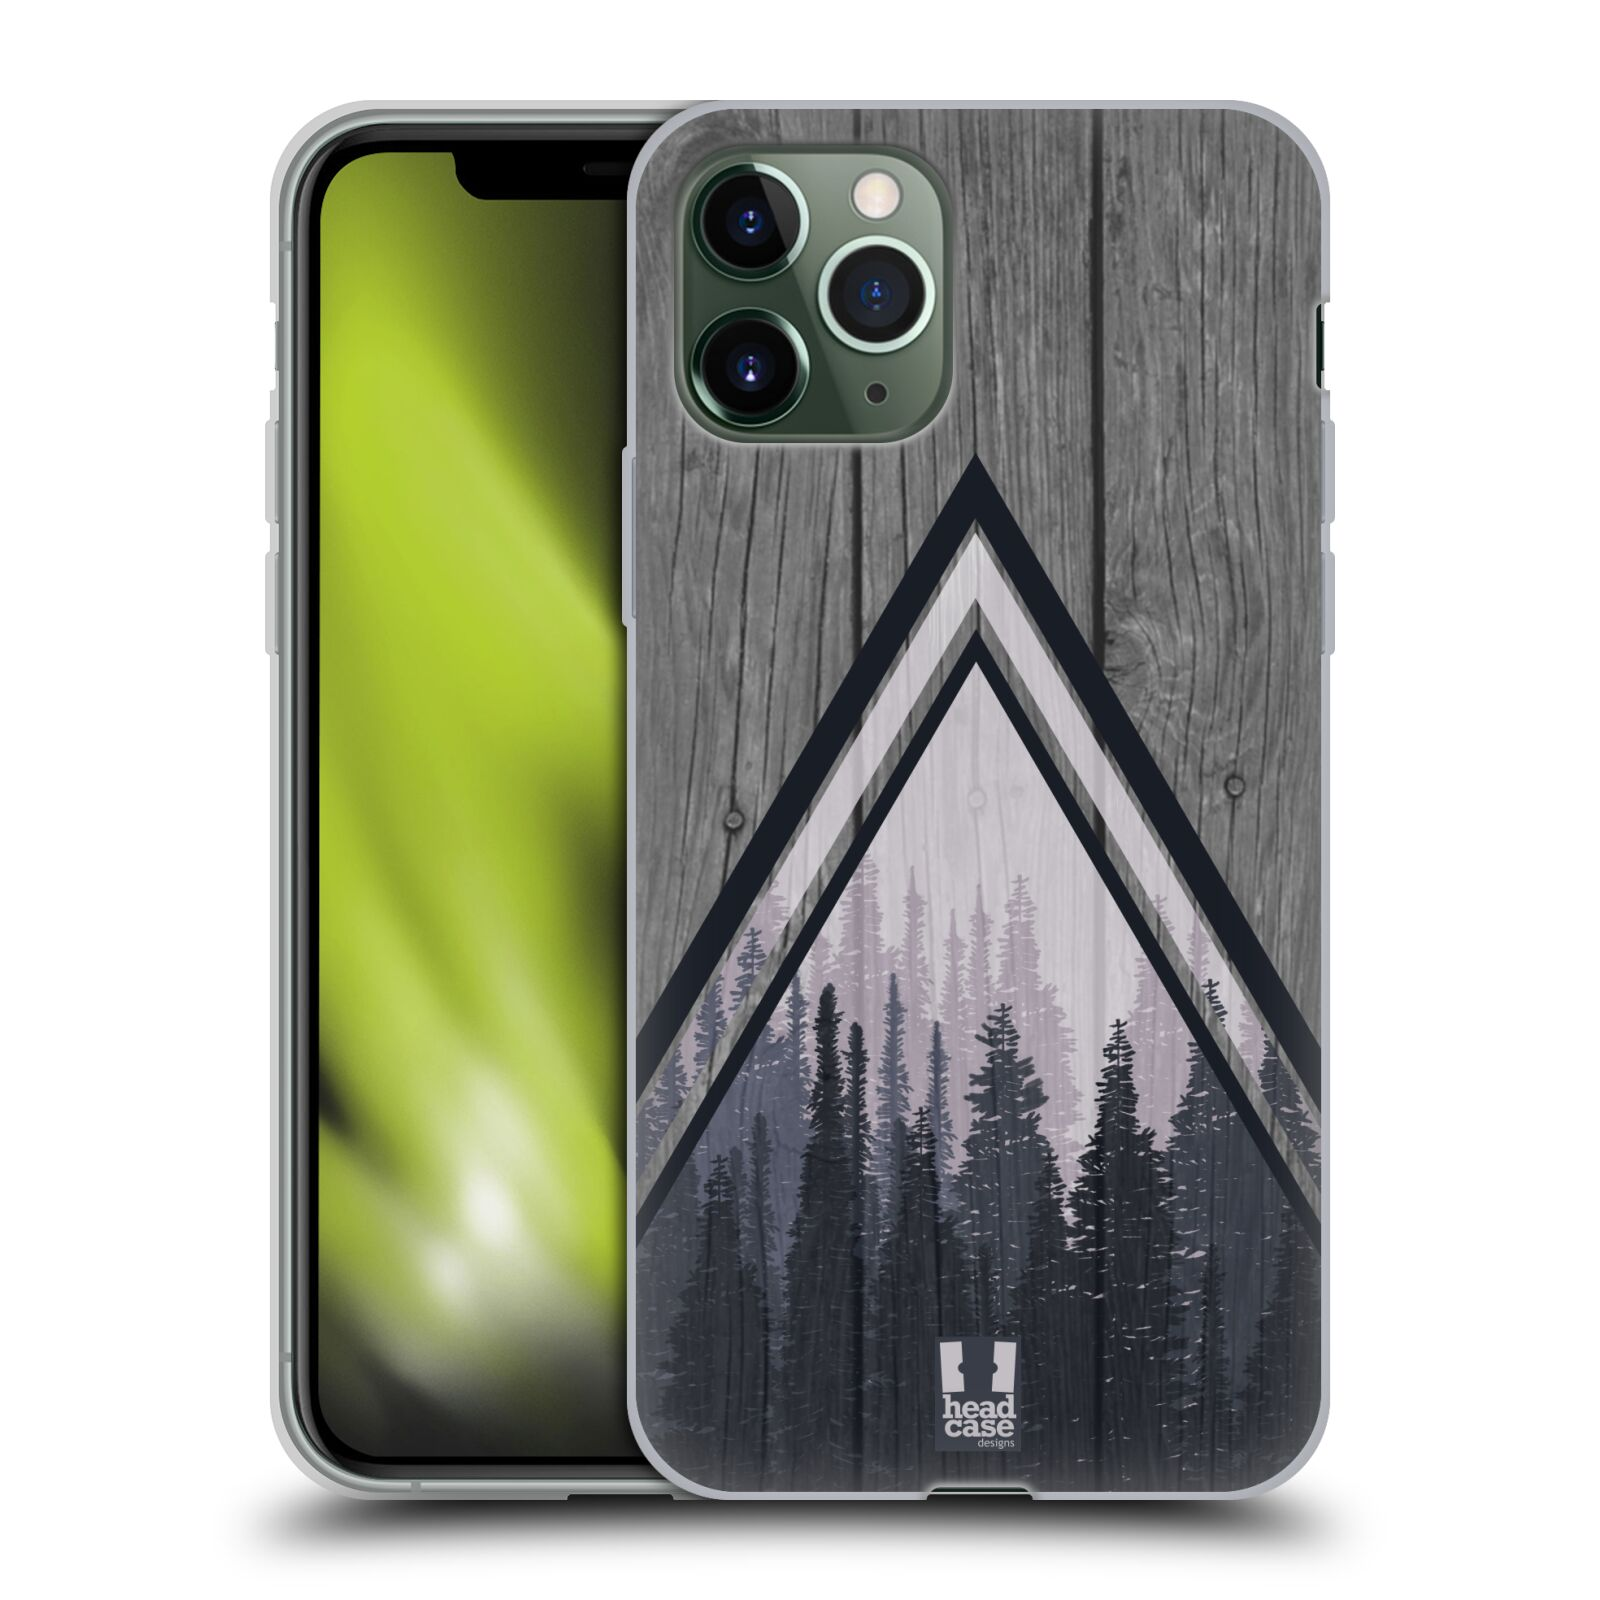 iphone 6 s plus kryt , Silikonové pouzdro na mobil Apple iPhone 11 Pro - Head Case - Dřevo a temný les